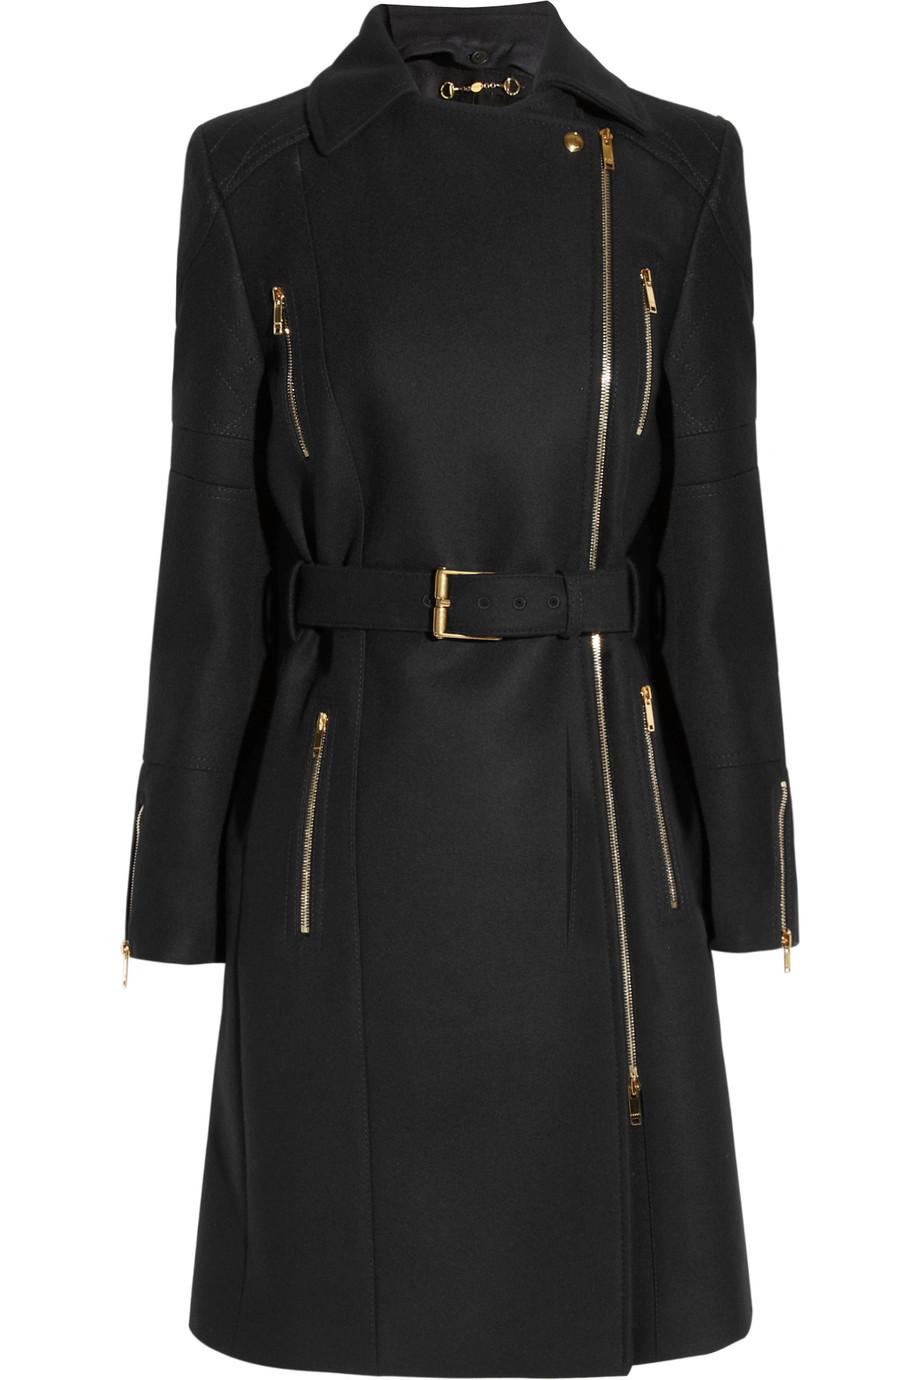 Gucci Belted Wool Felt Coat In Black Lyst